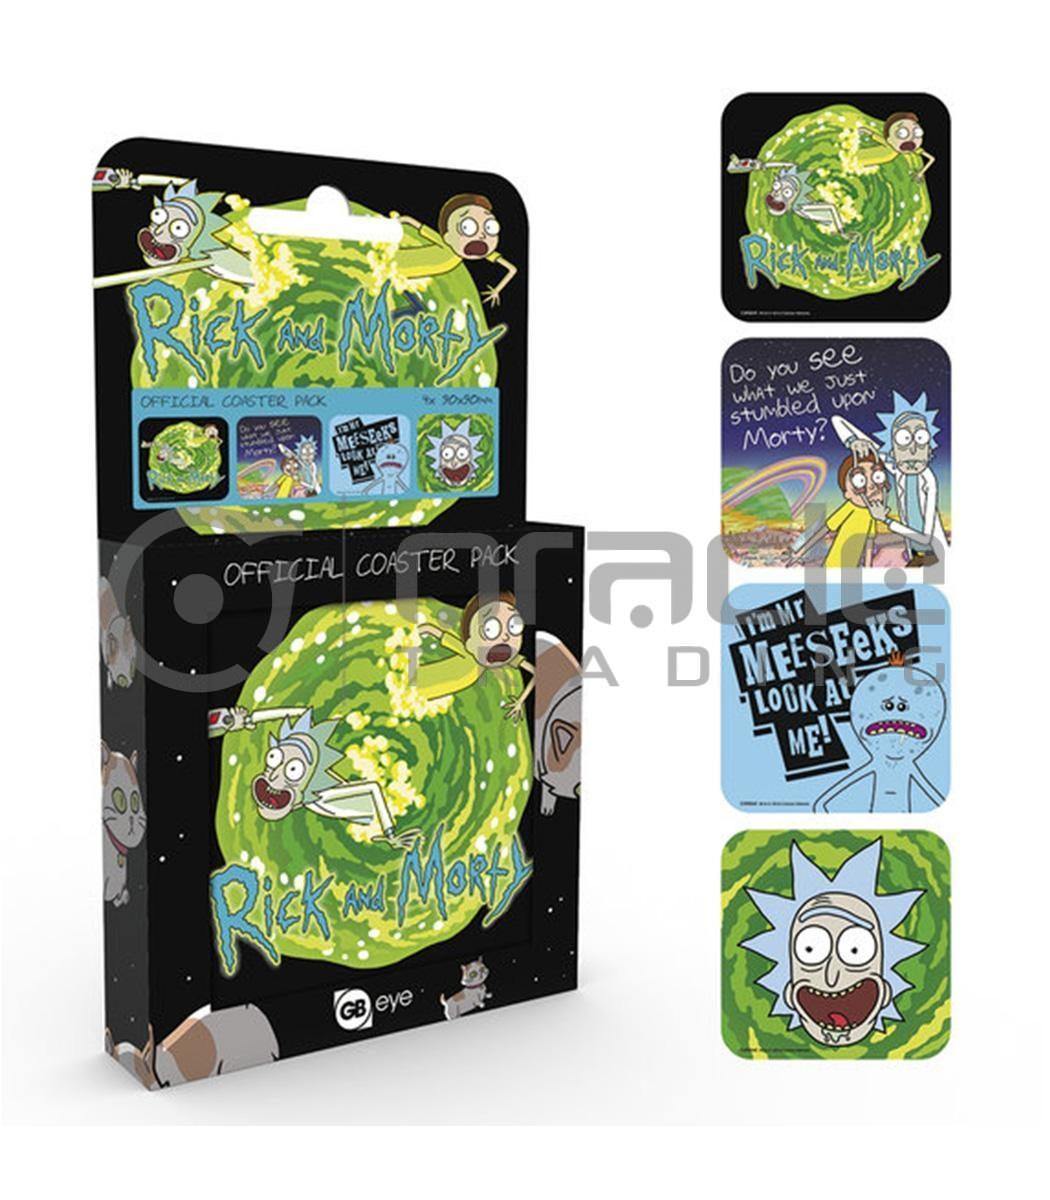 Rick & Morty 4-Pack Coaster Set